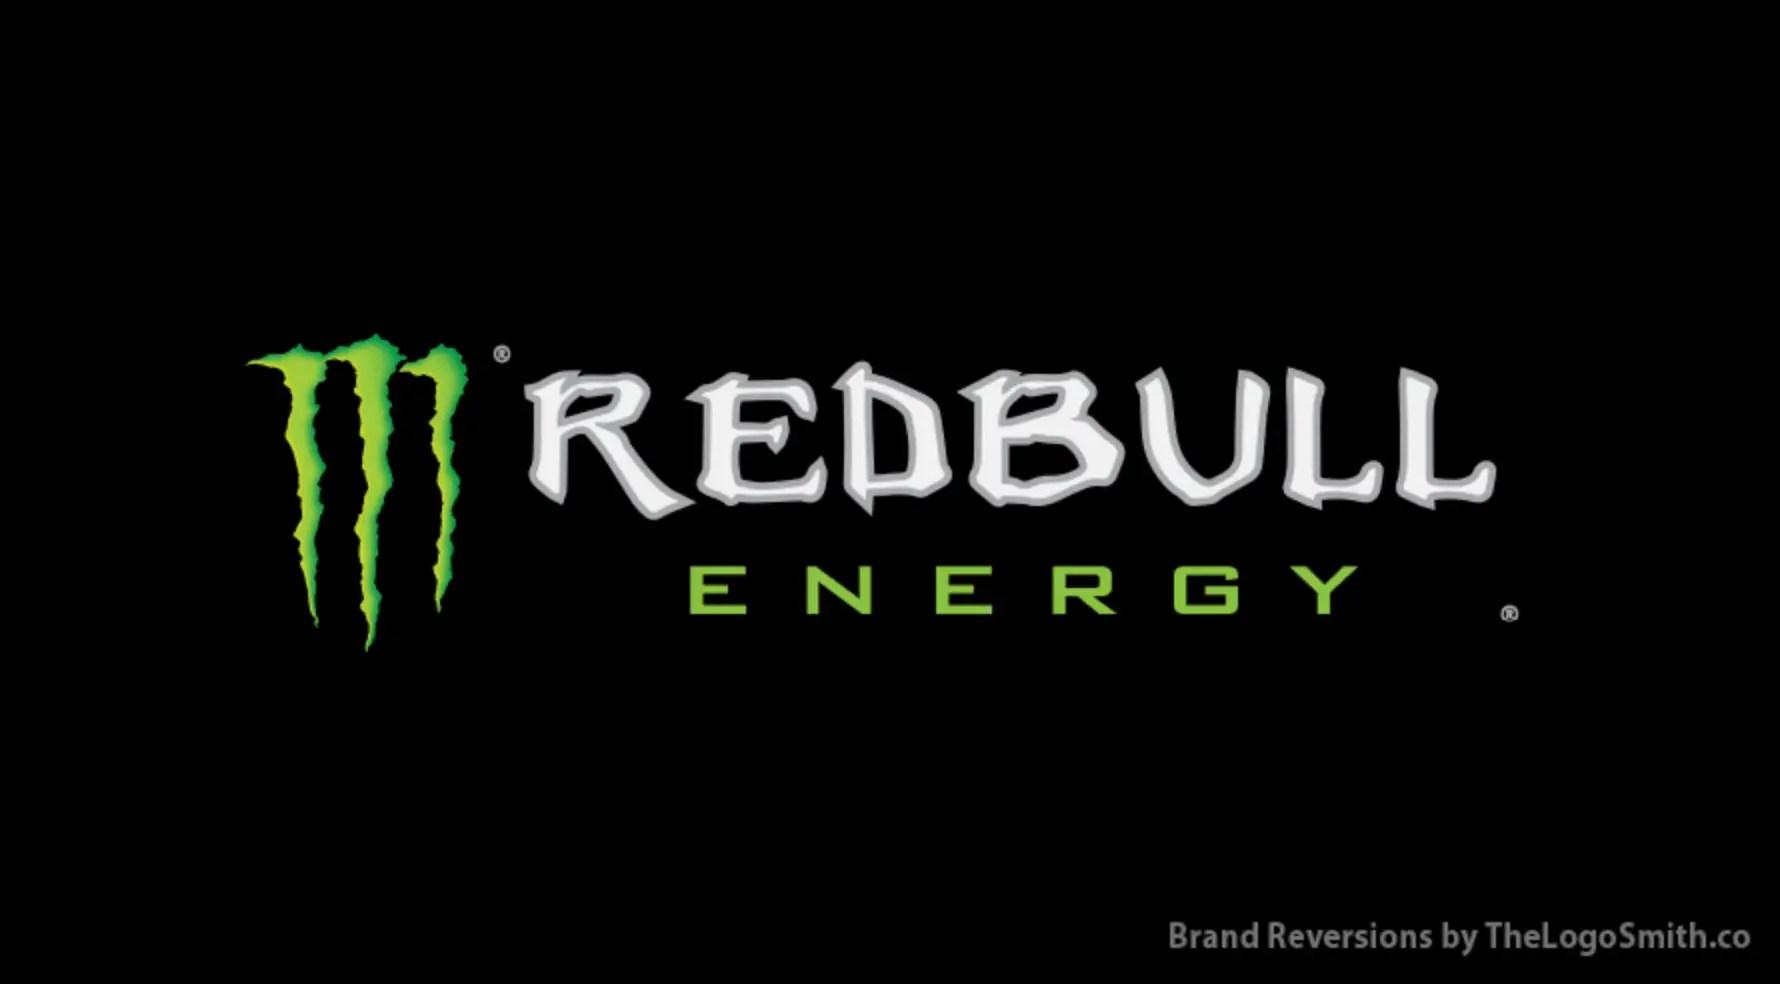 wersm-brand-reversioning-monster-redbull